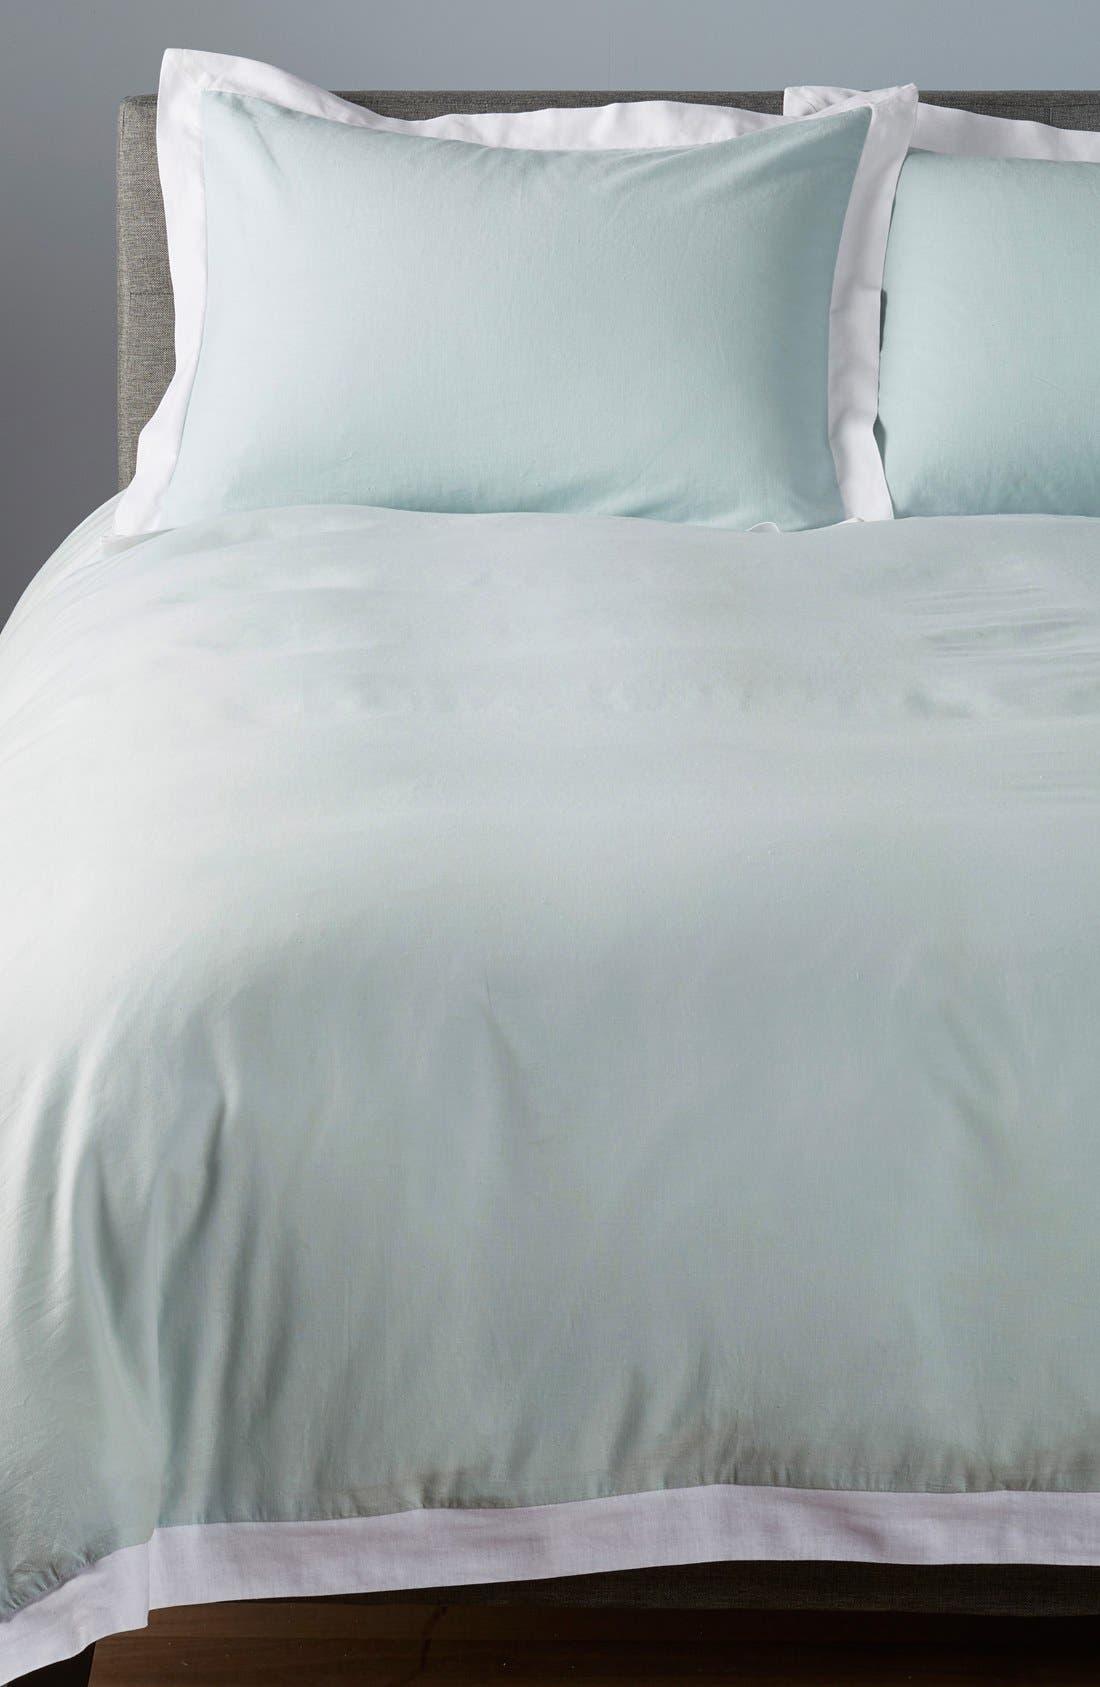 Levtex 'Spa' Washed Linen Duvet Cover